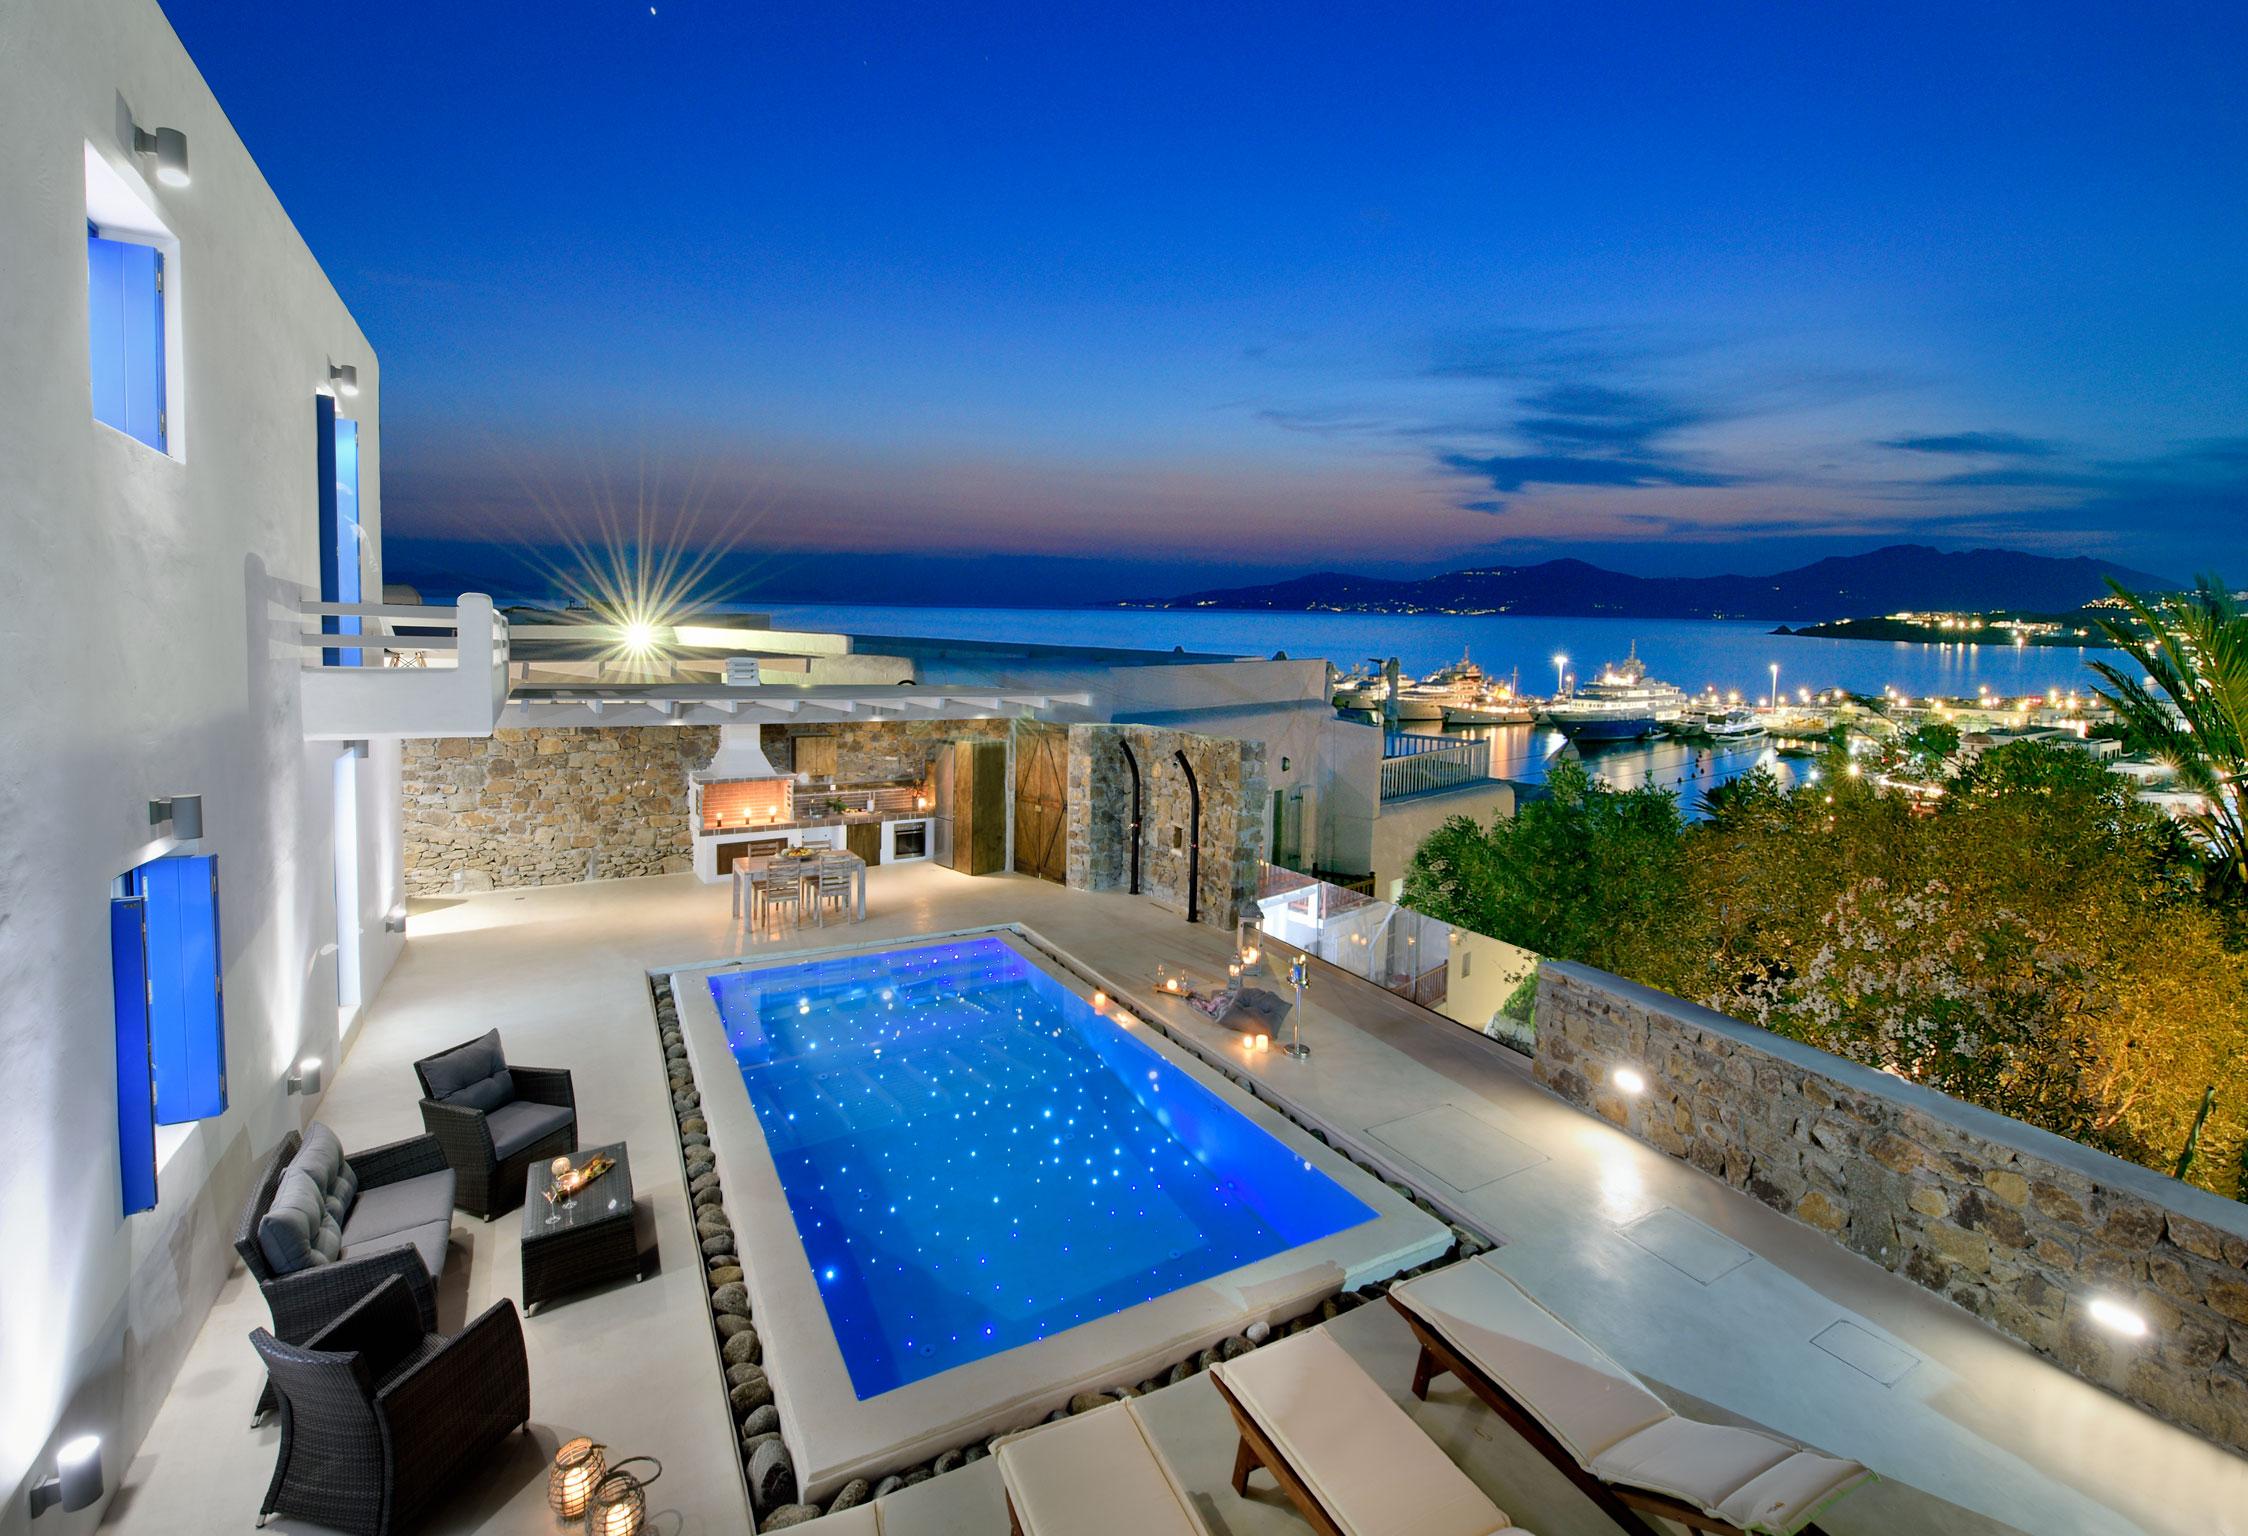 Mykonos Villa Athos jumbotron image